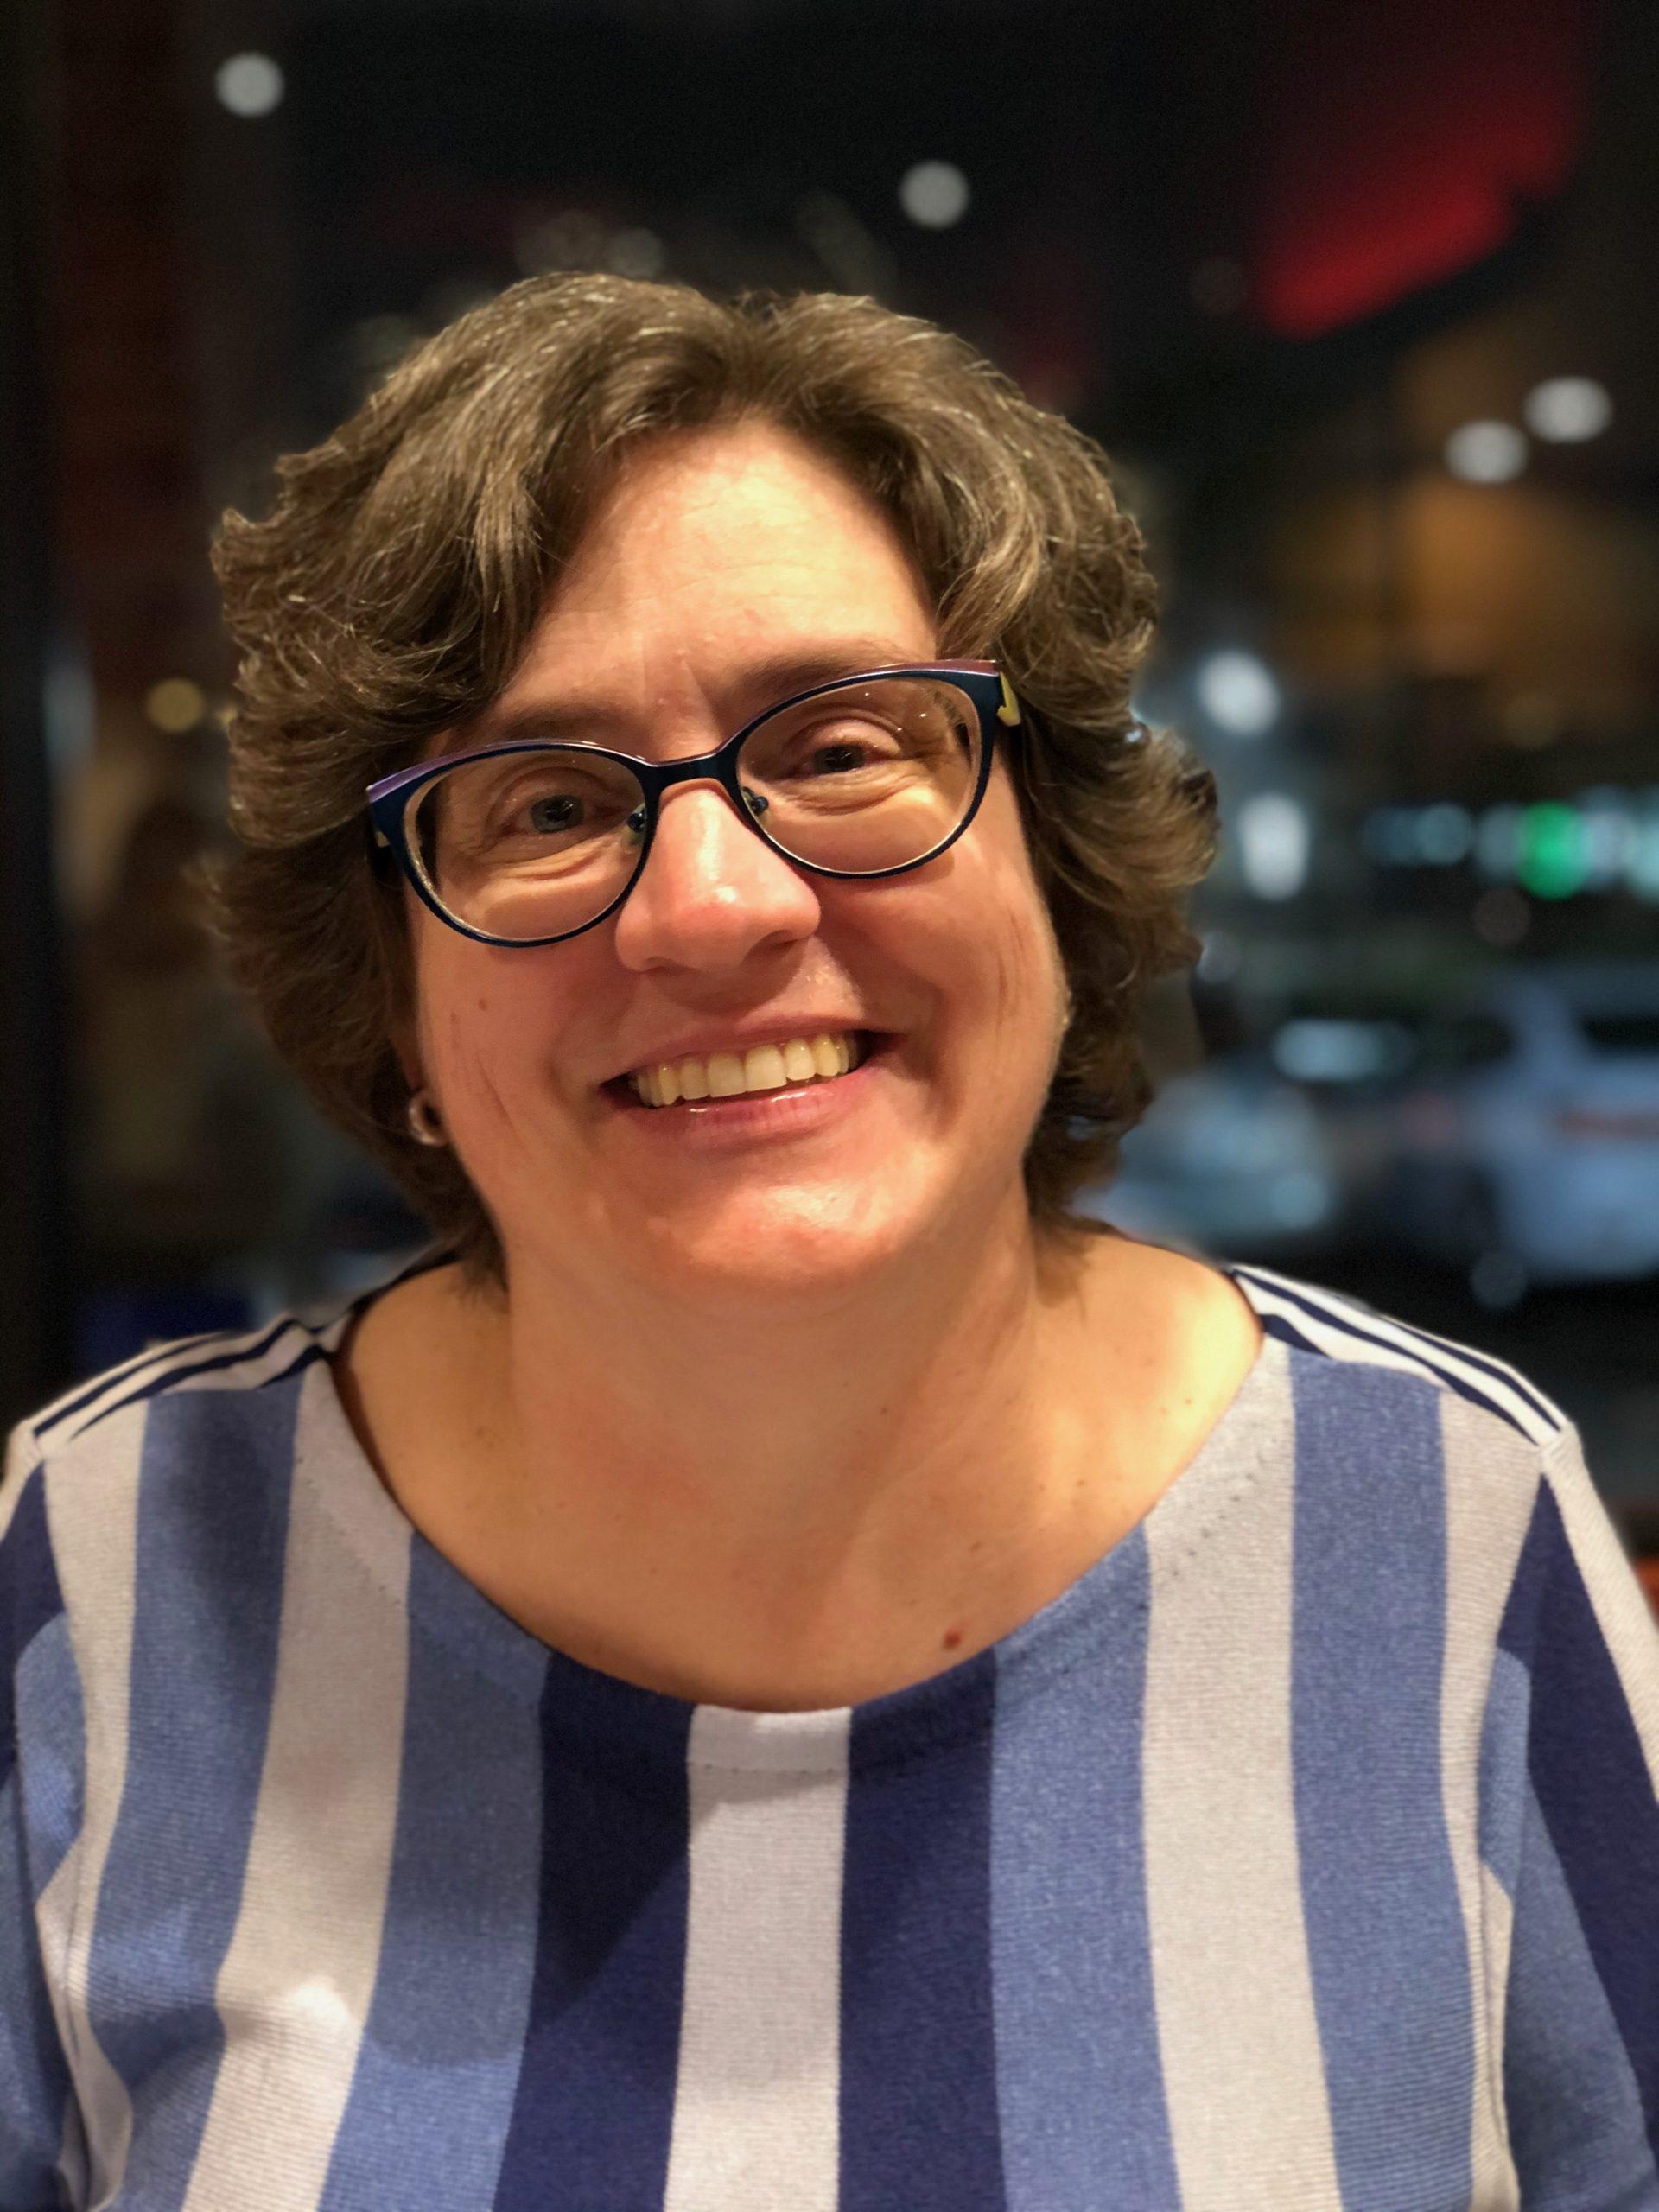 Cathy Berner's bio photo